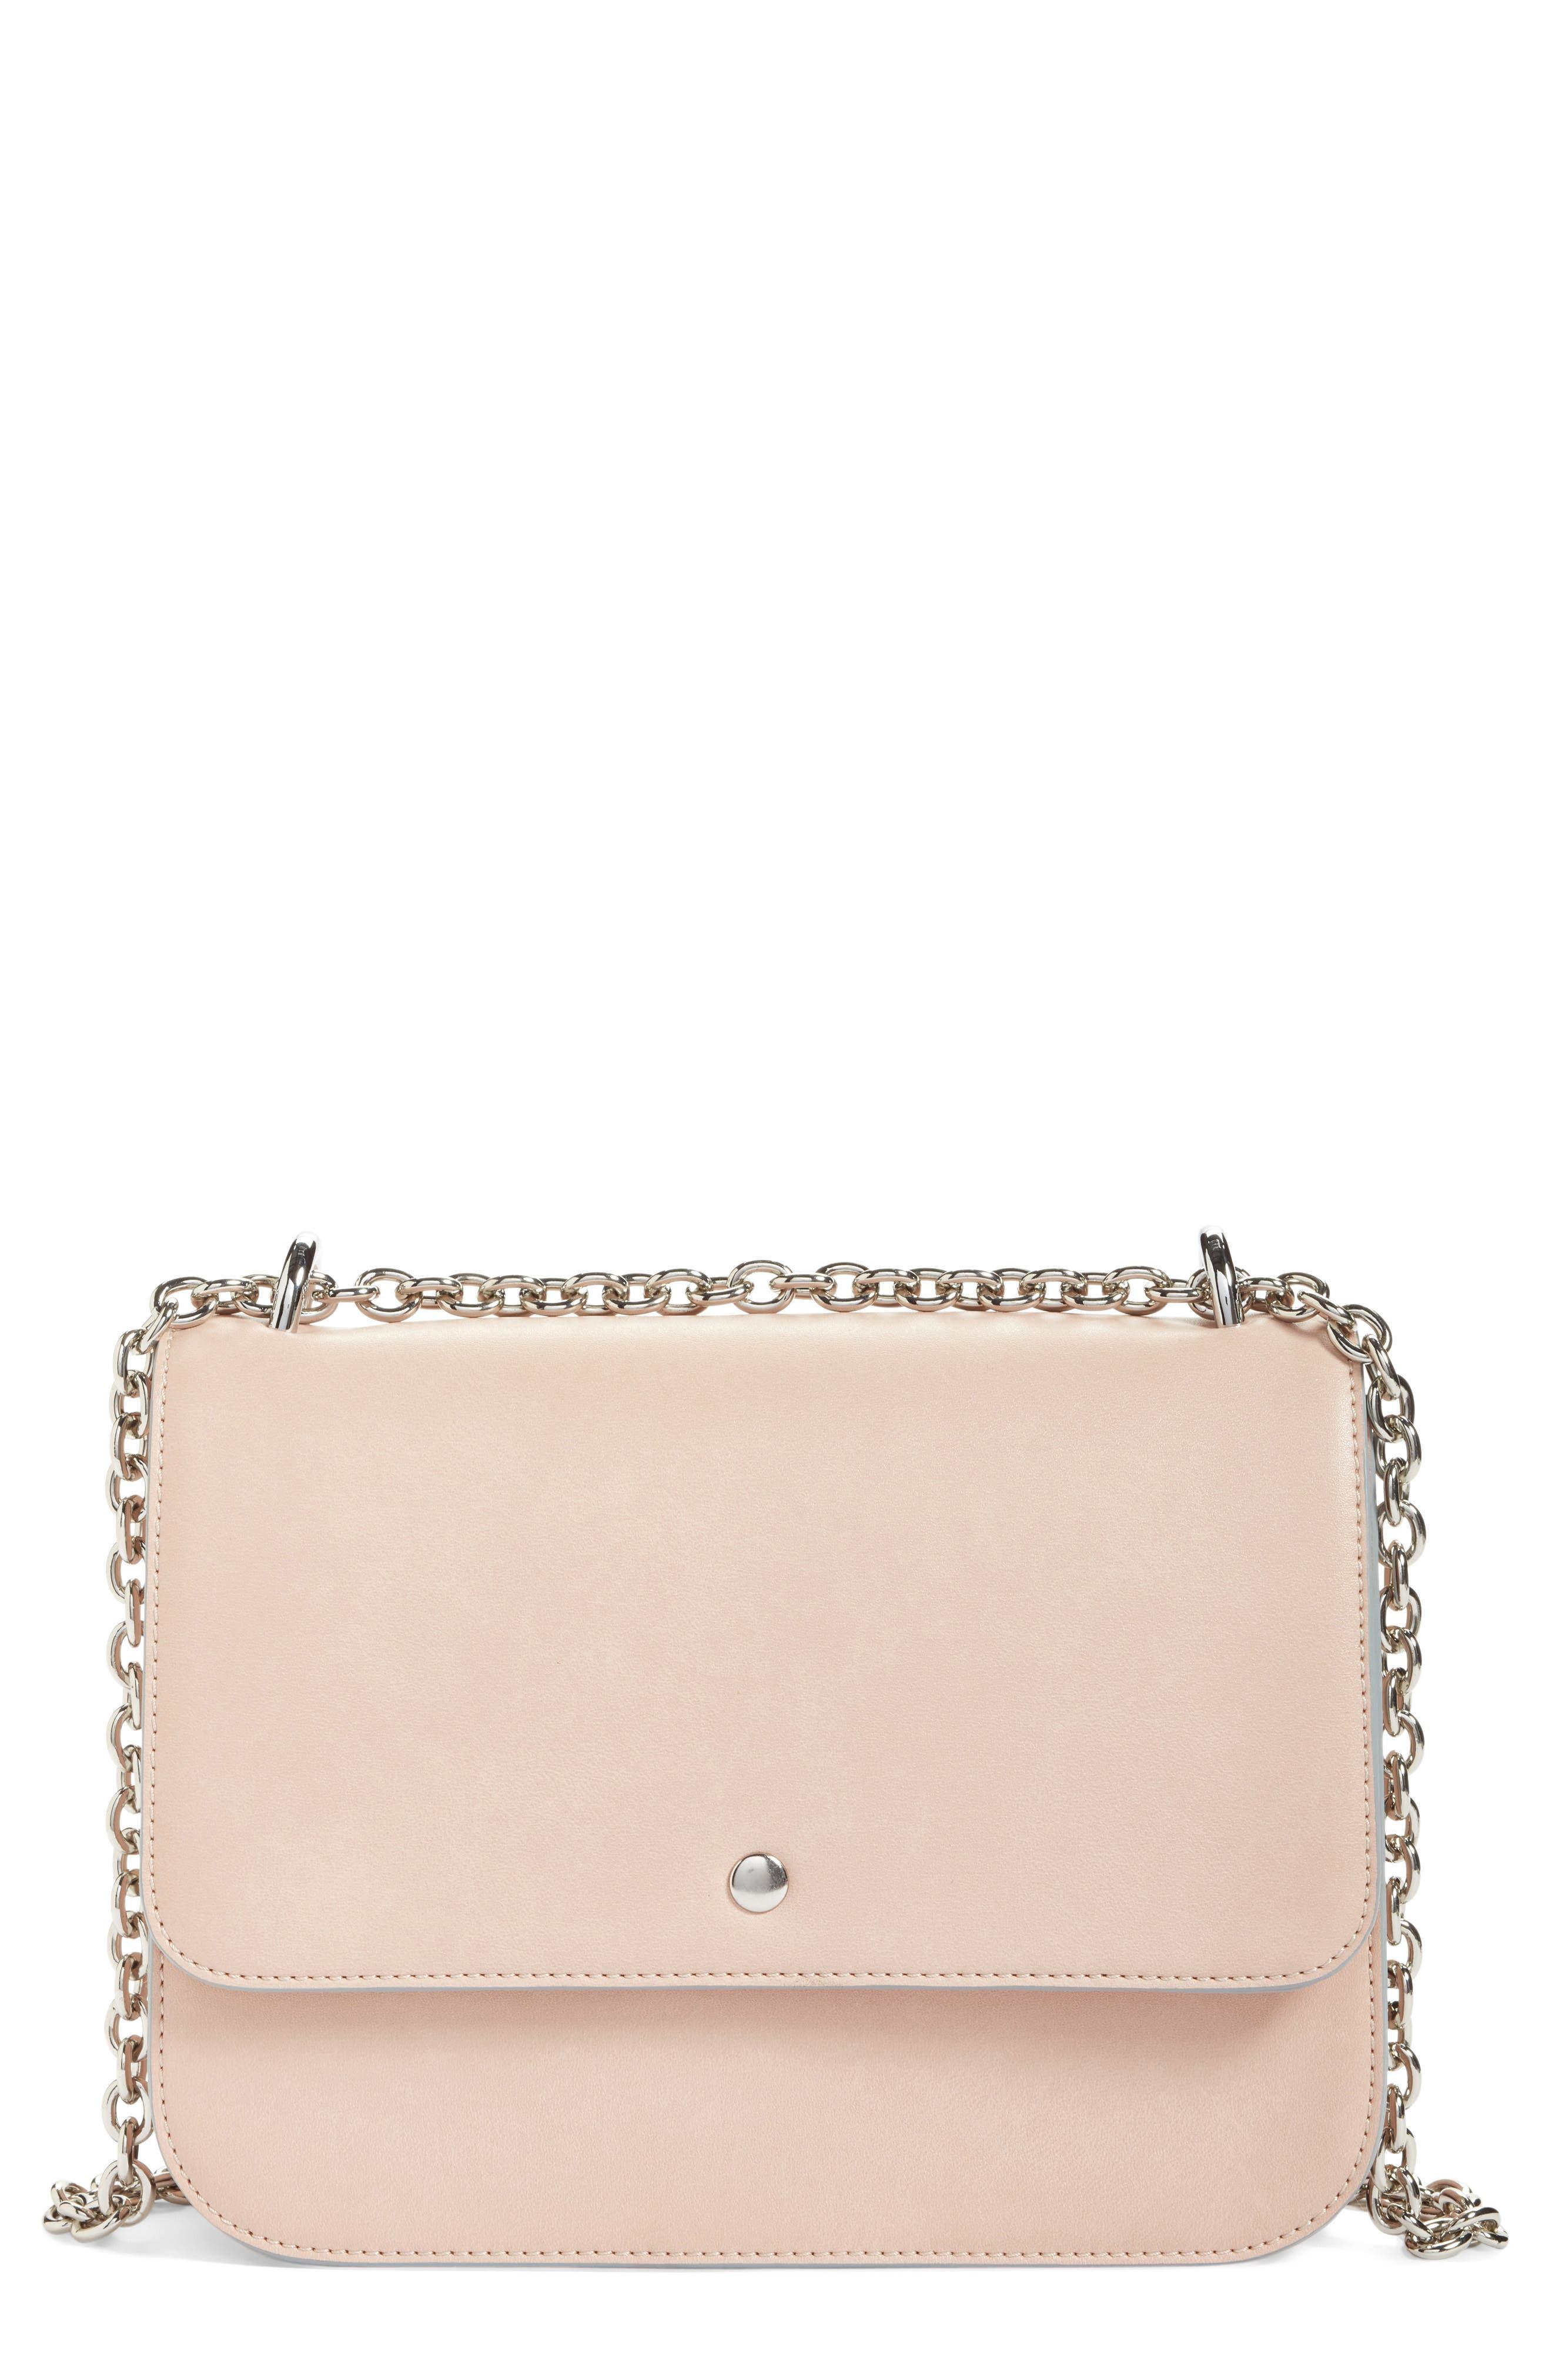 Alternate Image 1 Selected - Chelsea28 Dahlia Faux Leather Shoulder Bag